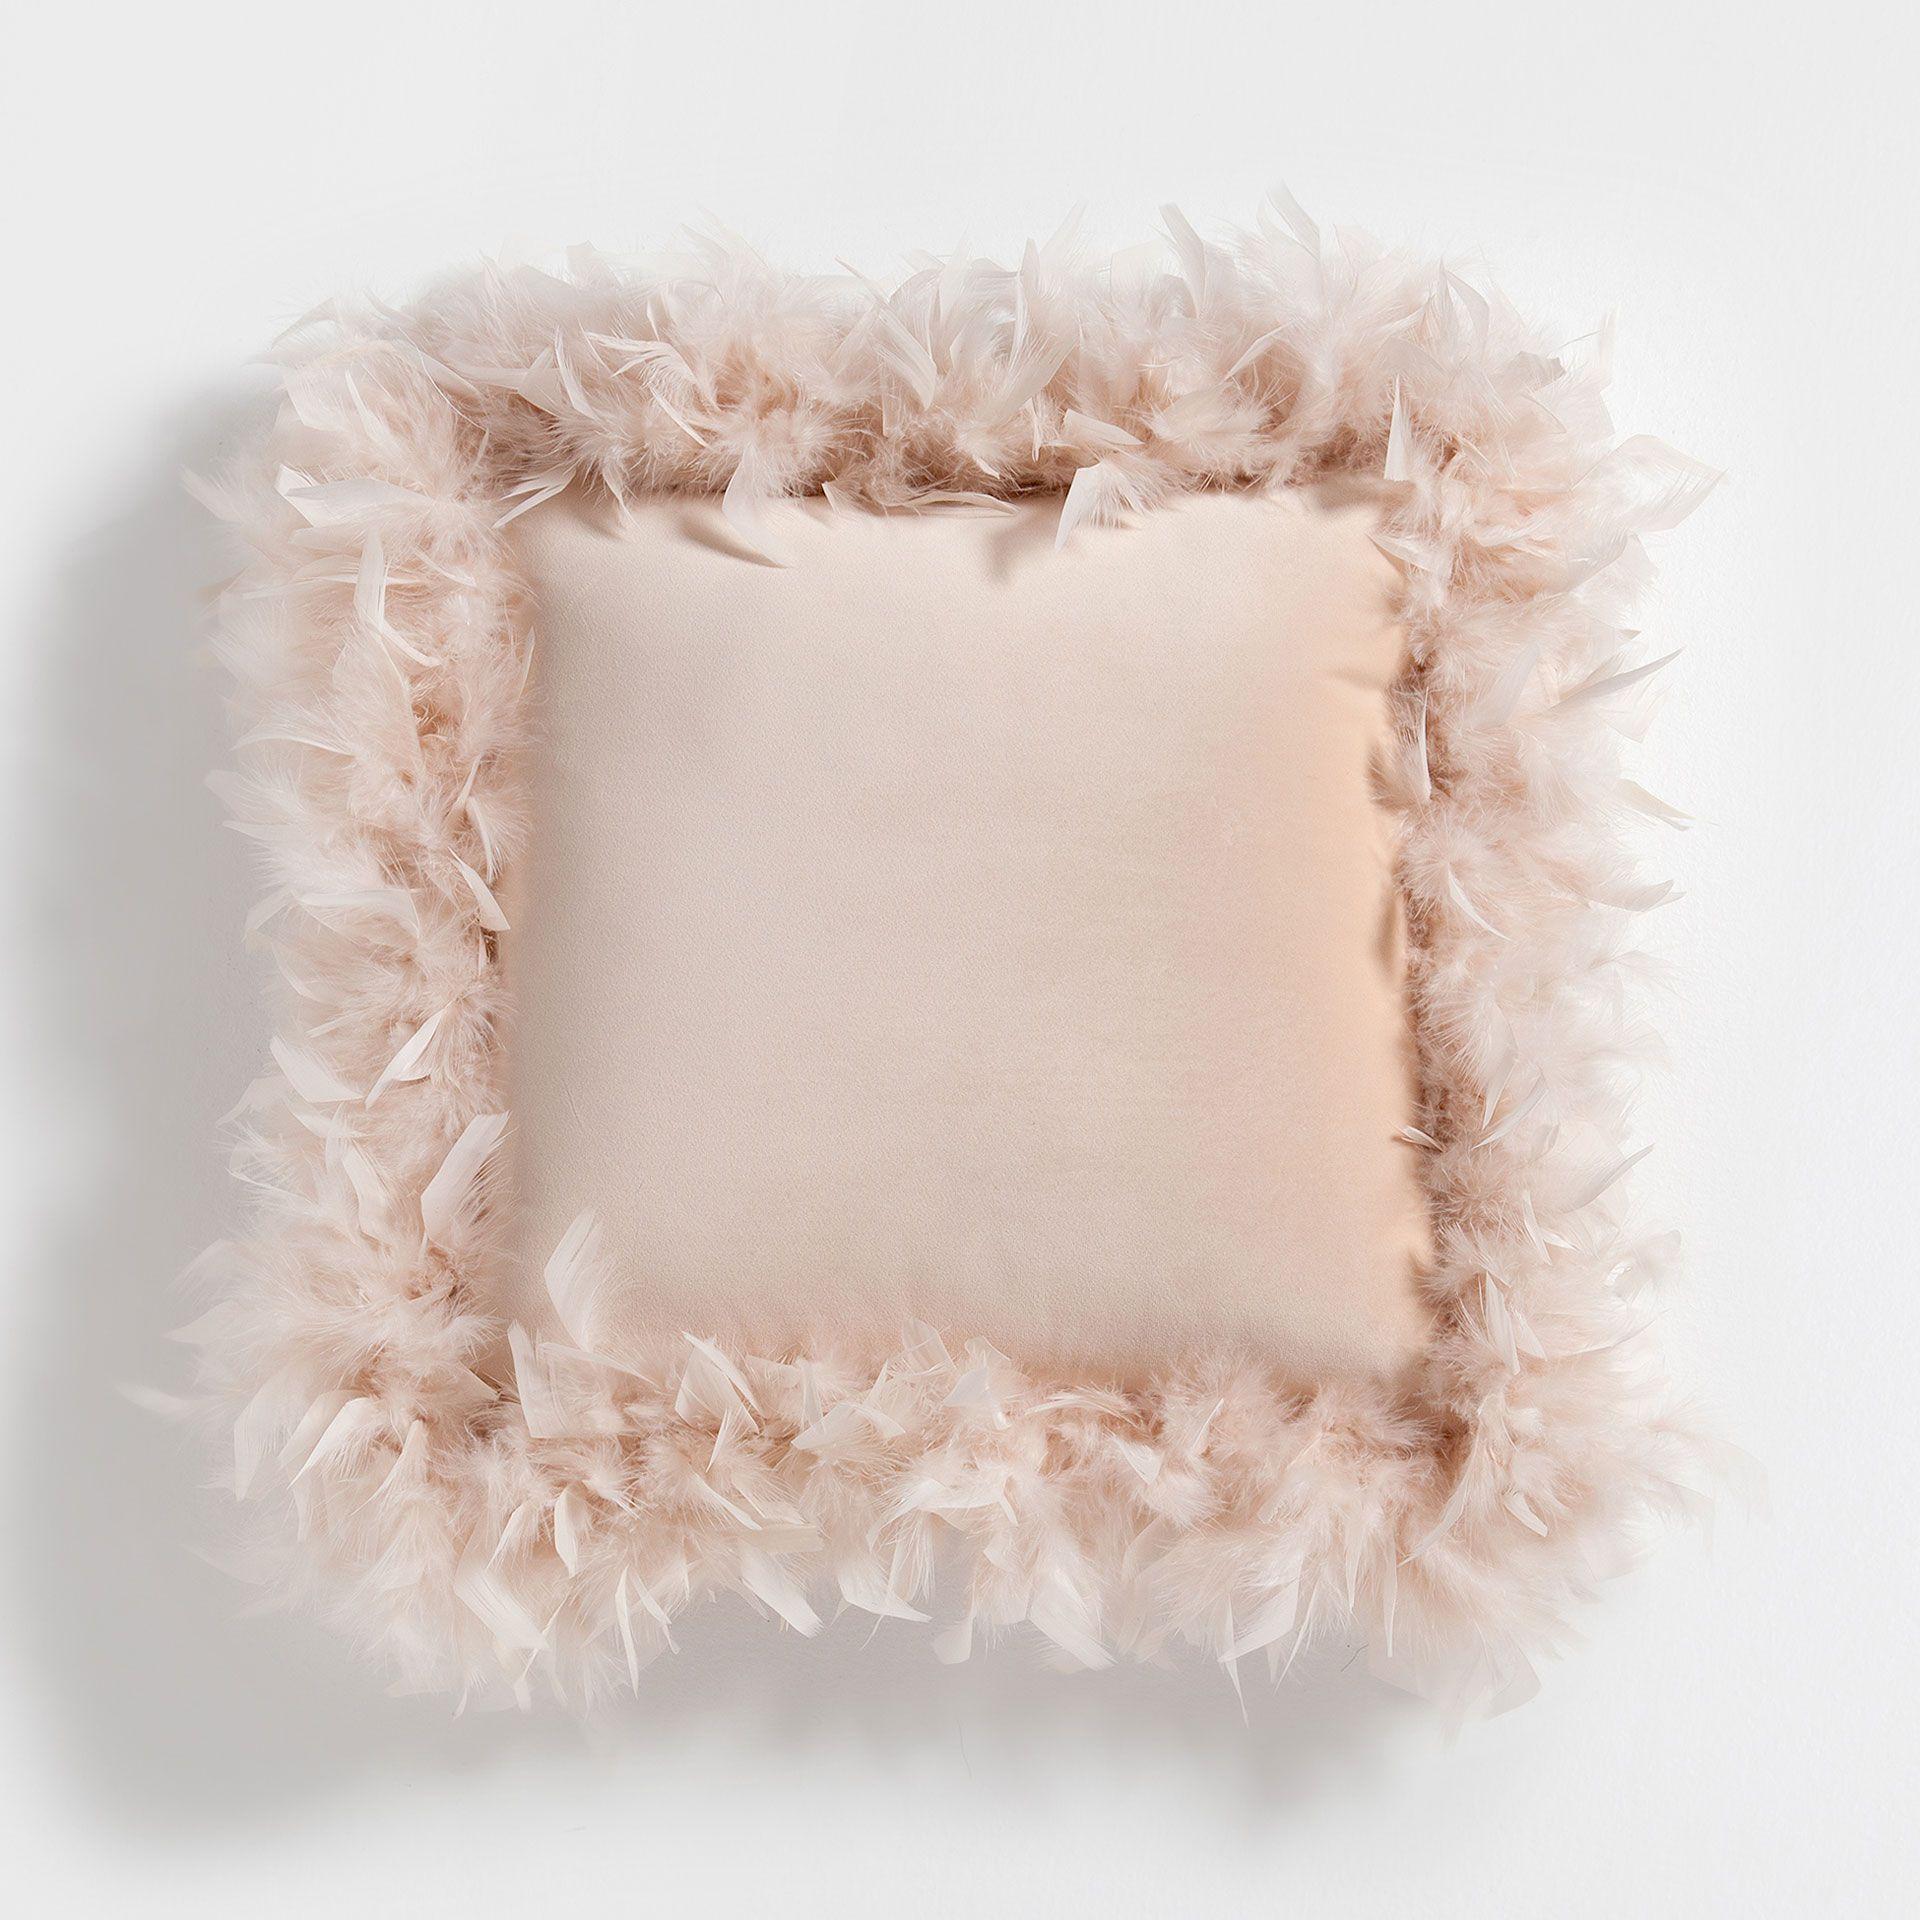 Dorm Room Ideas Decorative Pillows